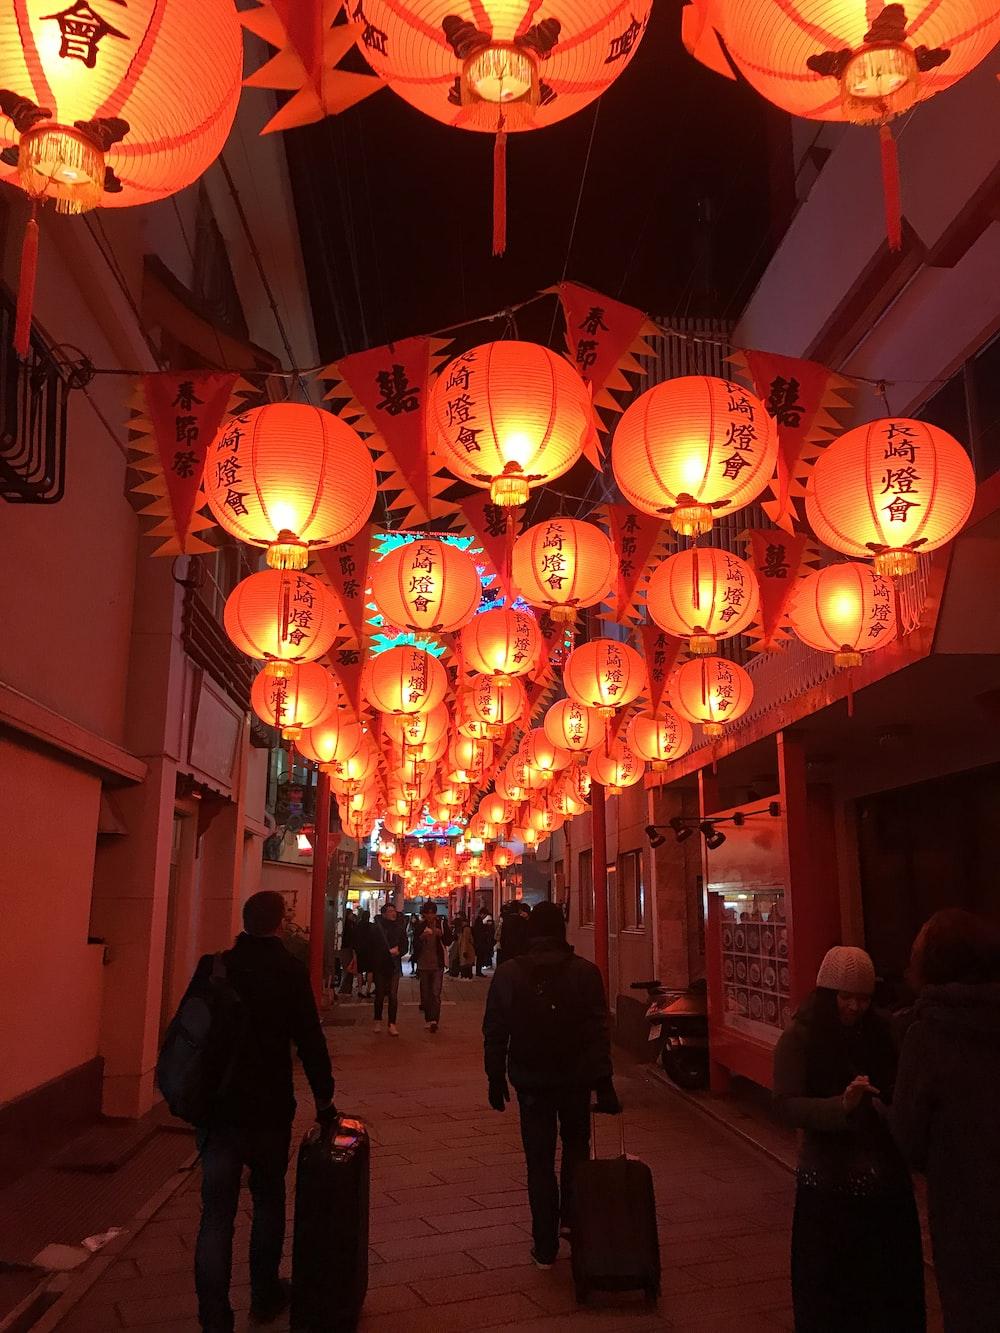 Chinese lanterns hung above people